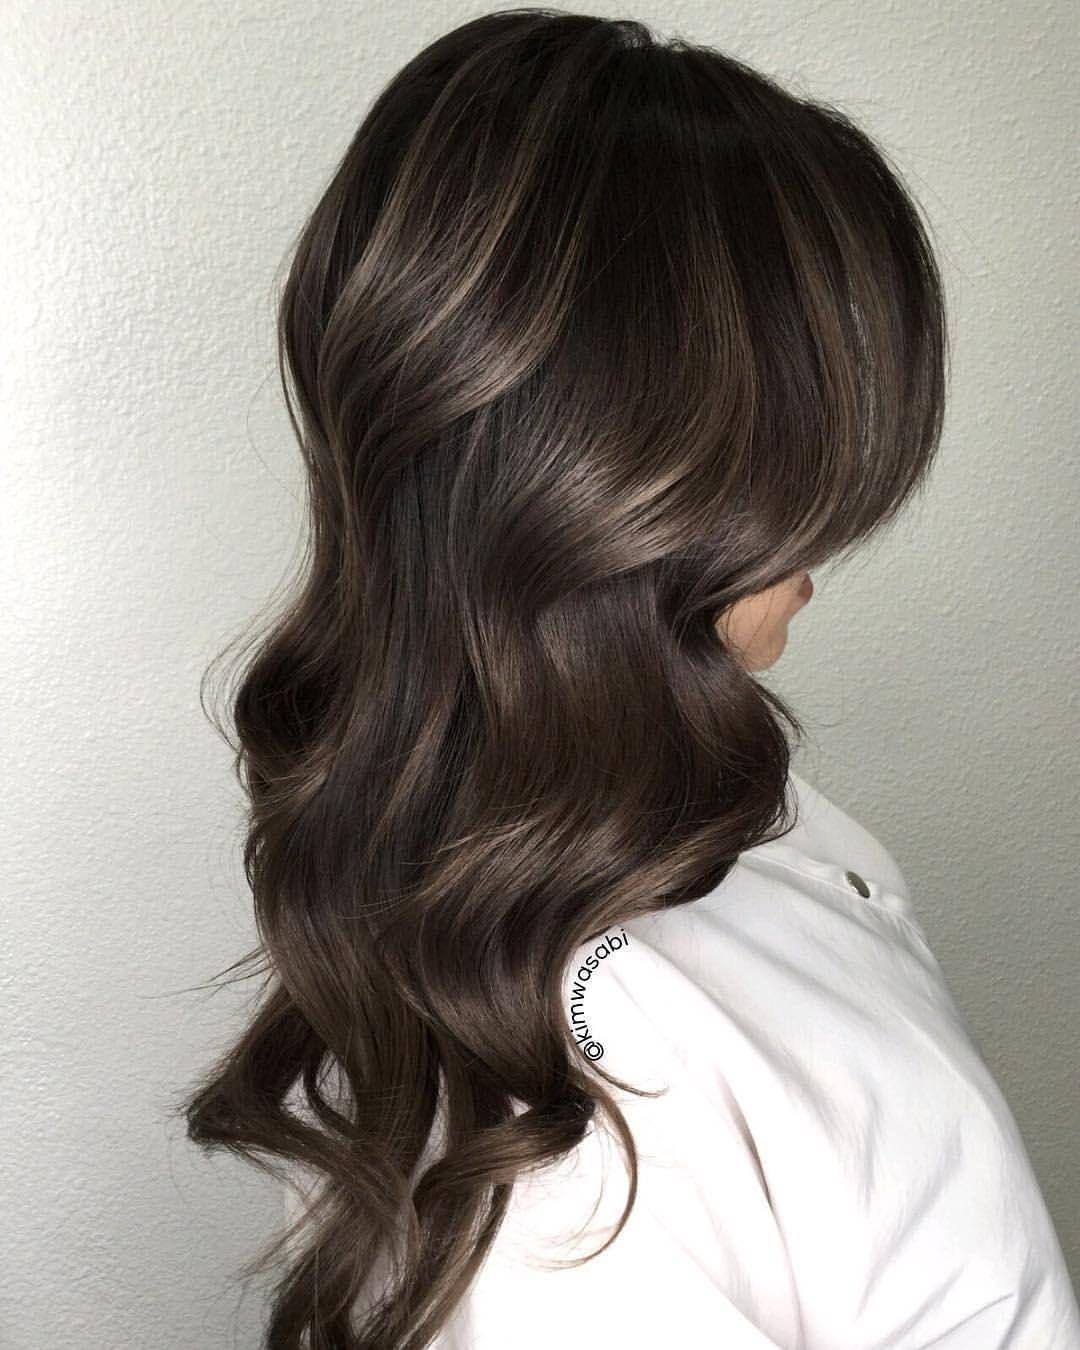 Pin By Sarah Nguyen On Cute Hair In 2019 Brown Hair